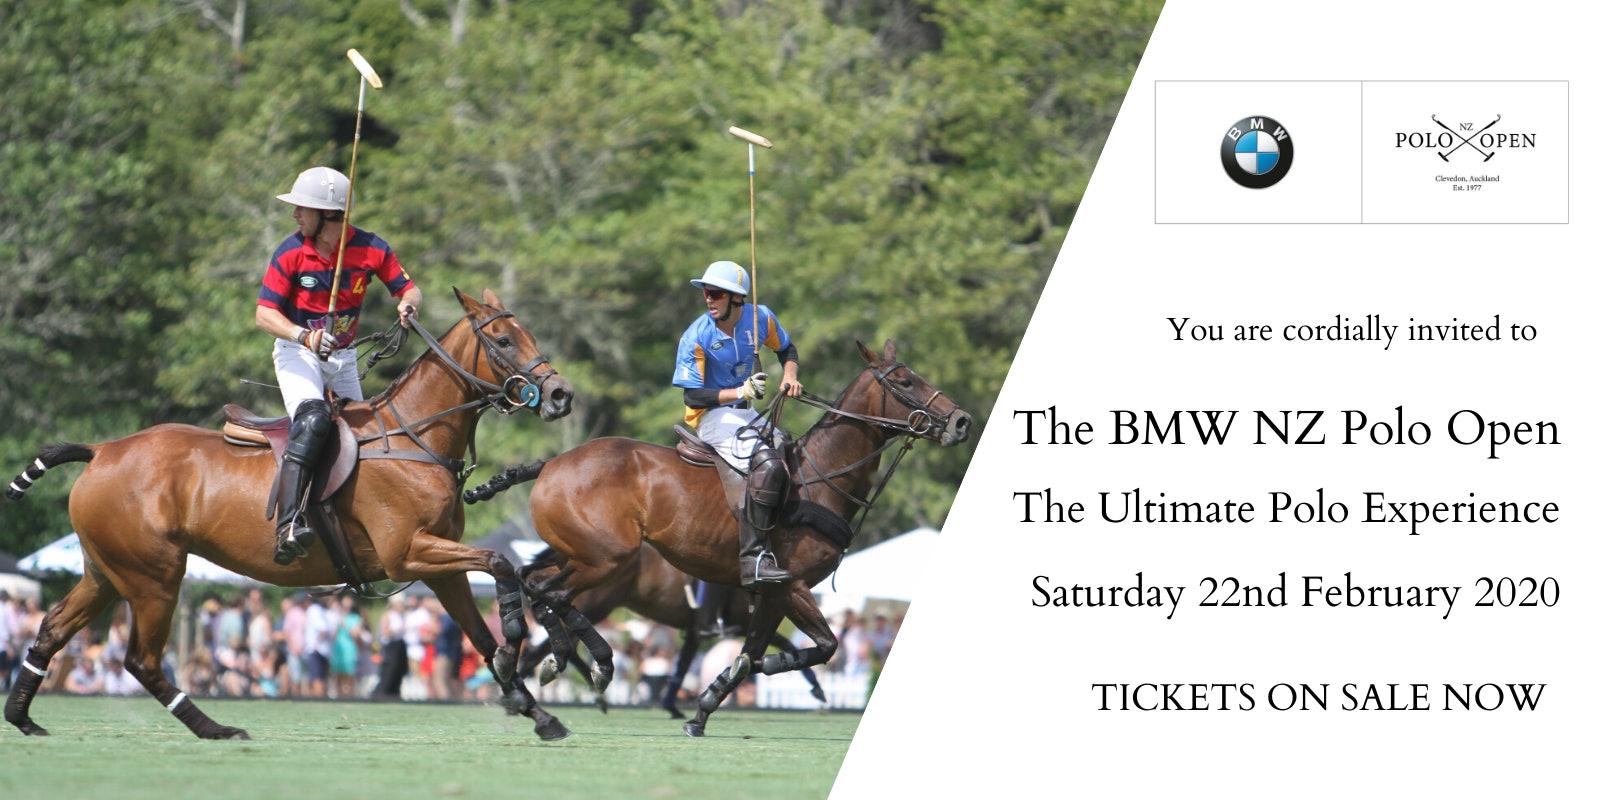 BMW NZ Polo Open